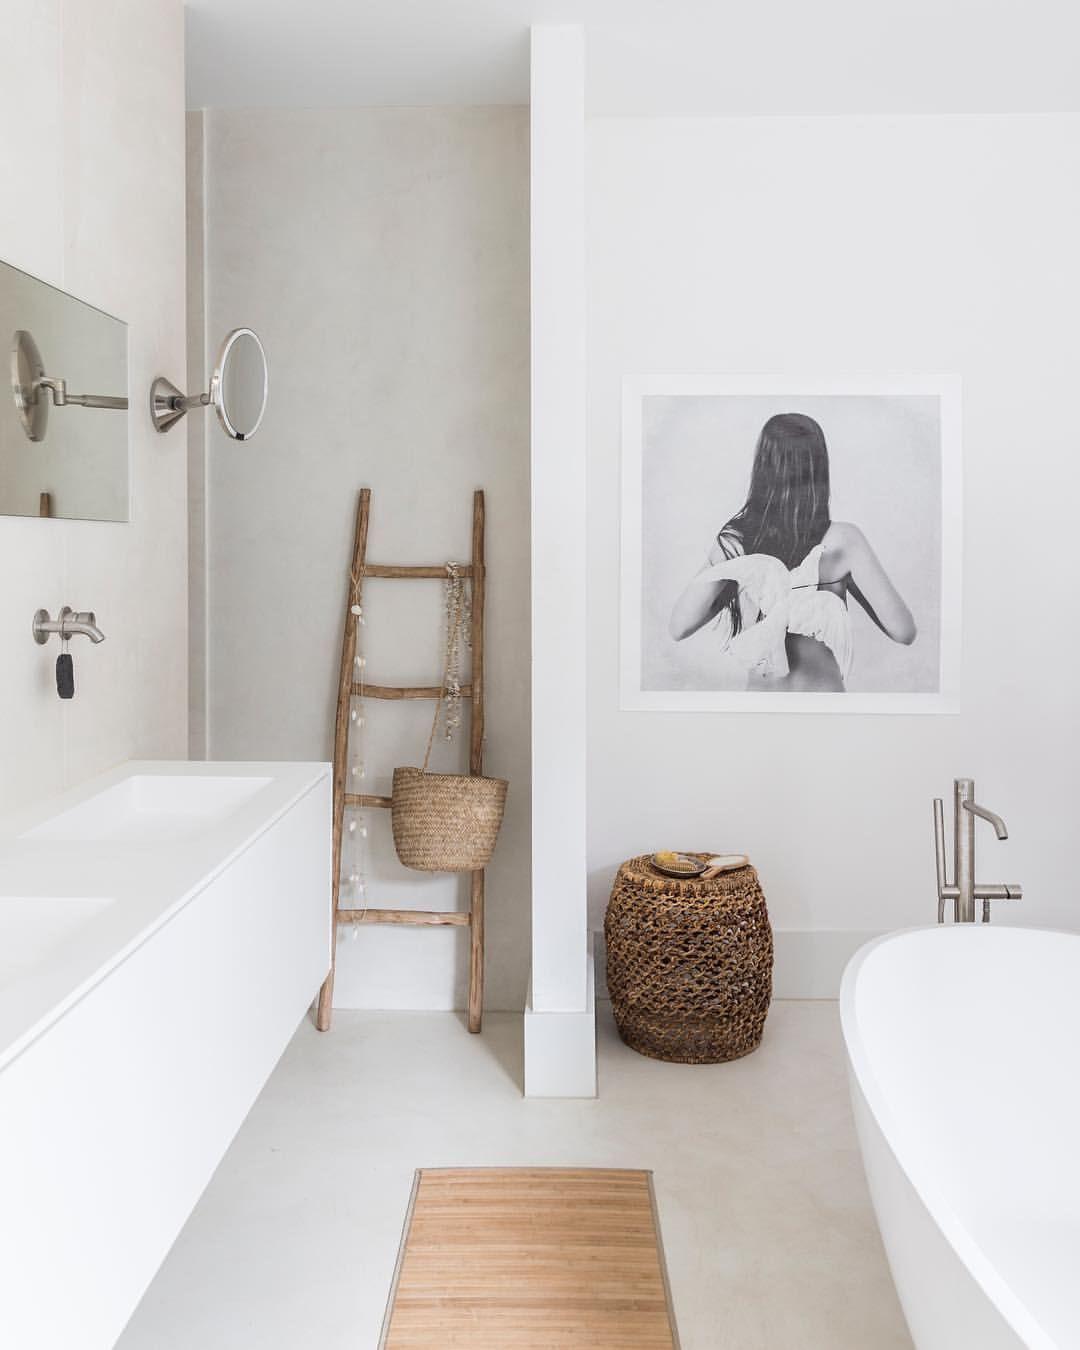 bathroom, white floor, white tub, white wall, white floating vanity, mirror, wooden rack, rattan basket